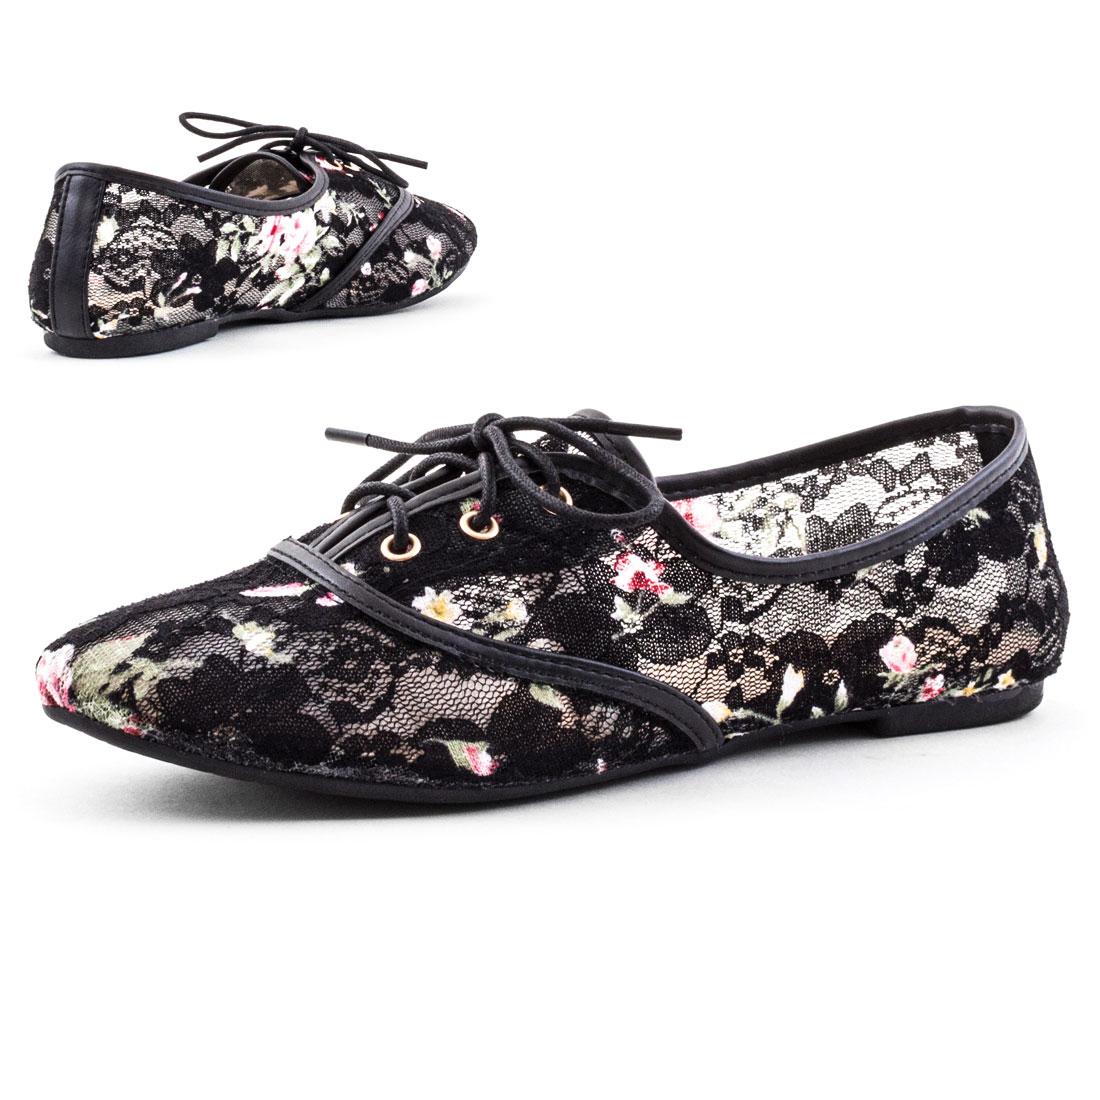 neu damen schn rer sommer ballerinas sneaker mit spitze gr 36 37 38 39 40 41 ebay. Black Bedroom Furniture Sets. Home Design Ideas